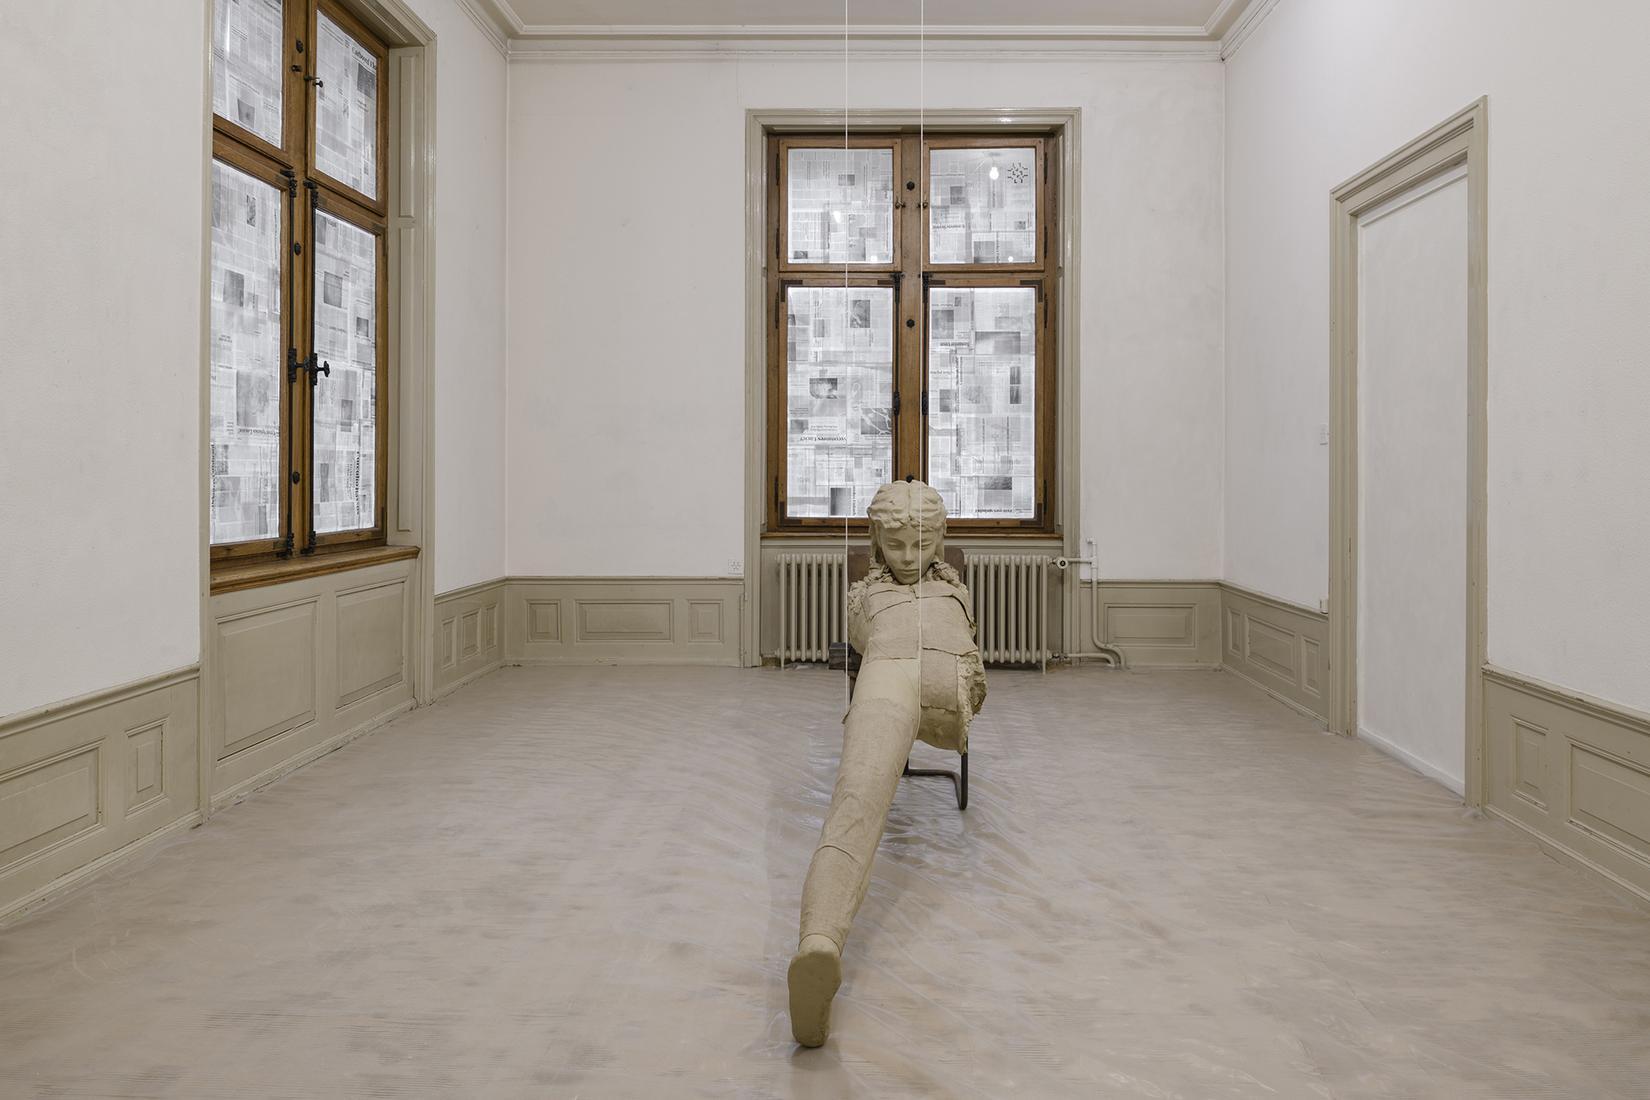 June 11 —  June 17, 2018 - Offene Kirche Elisabethen, Pfarrhaus, Elisabethenstrasse 10 & Naturhistorisches Museum Basel - Art Basel Parcours - Exhibitions